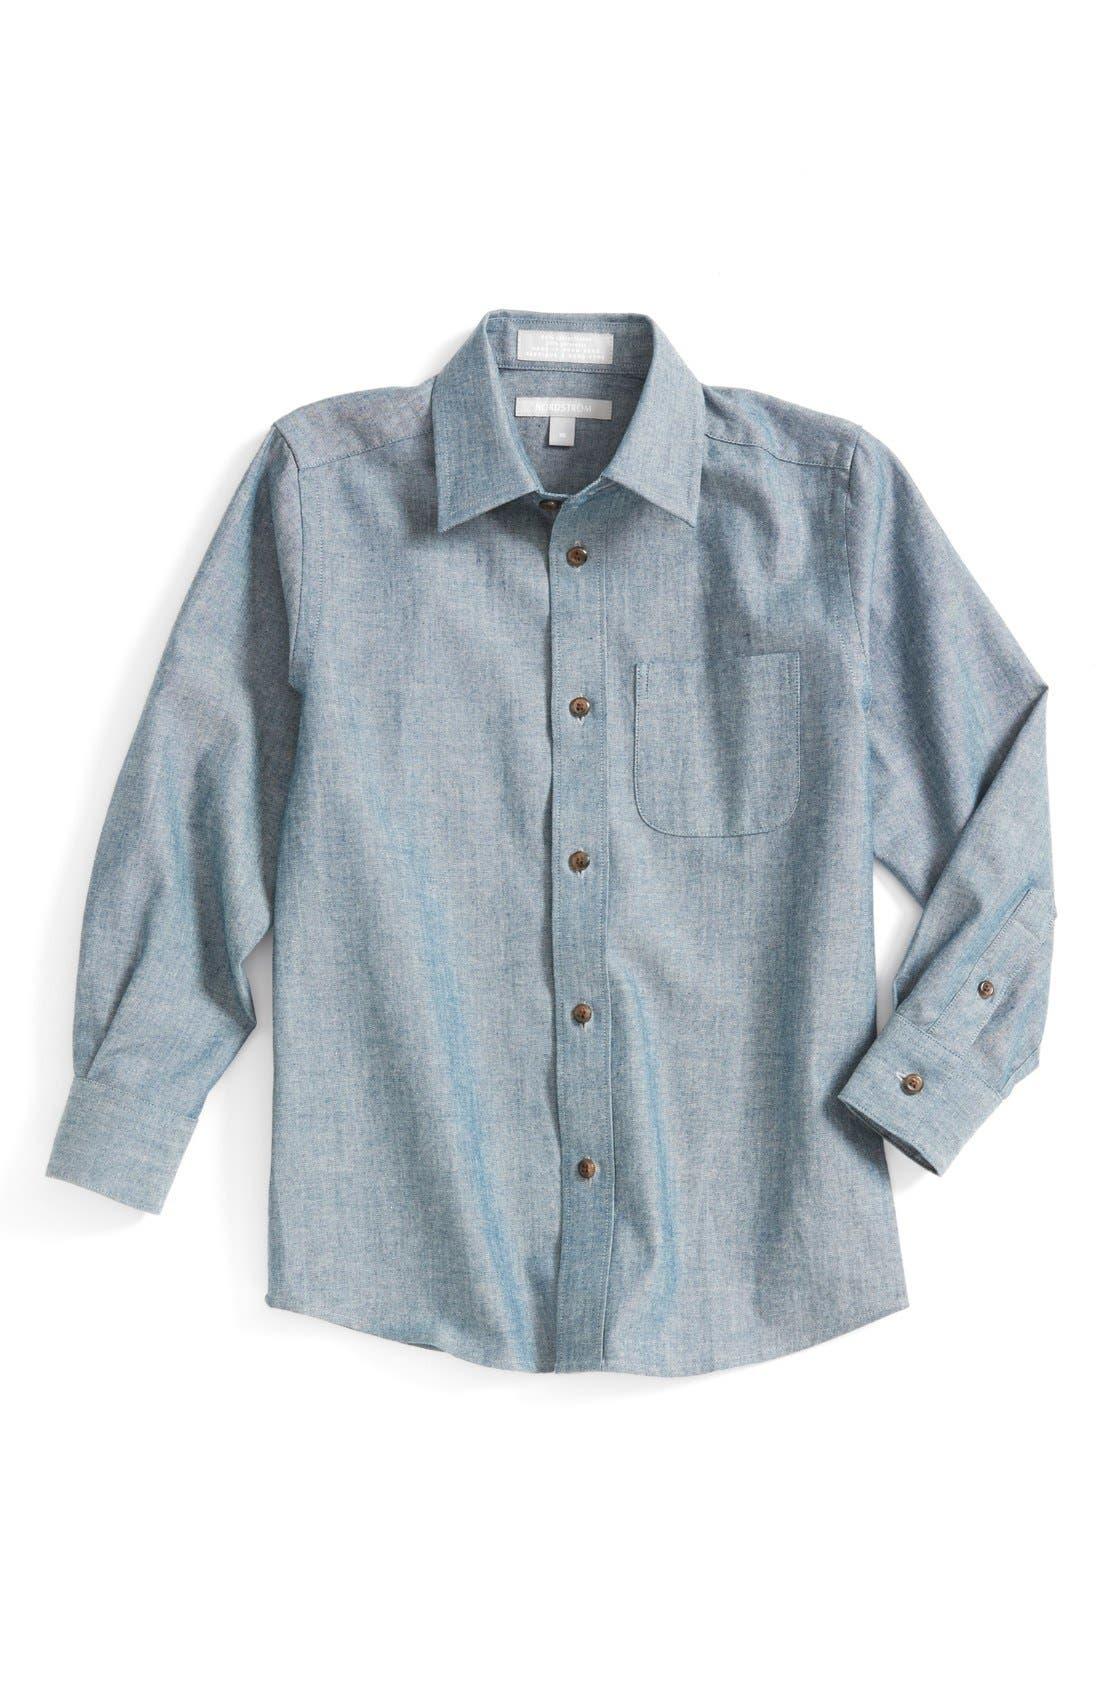 Main Image - Nordstrom 'Edgar' Cotton Chambray Shirt (Toddler Boys & Little Boys)